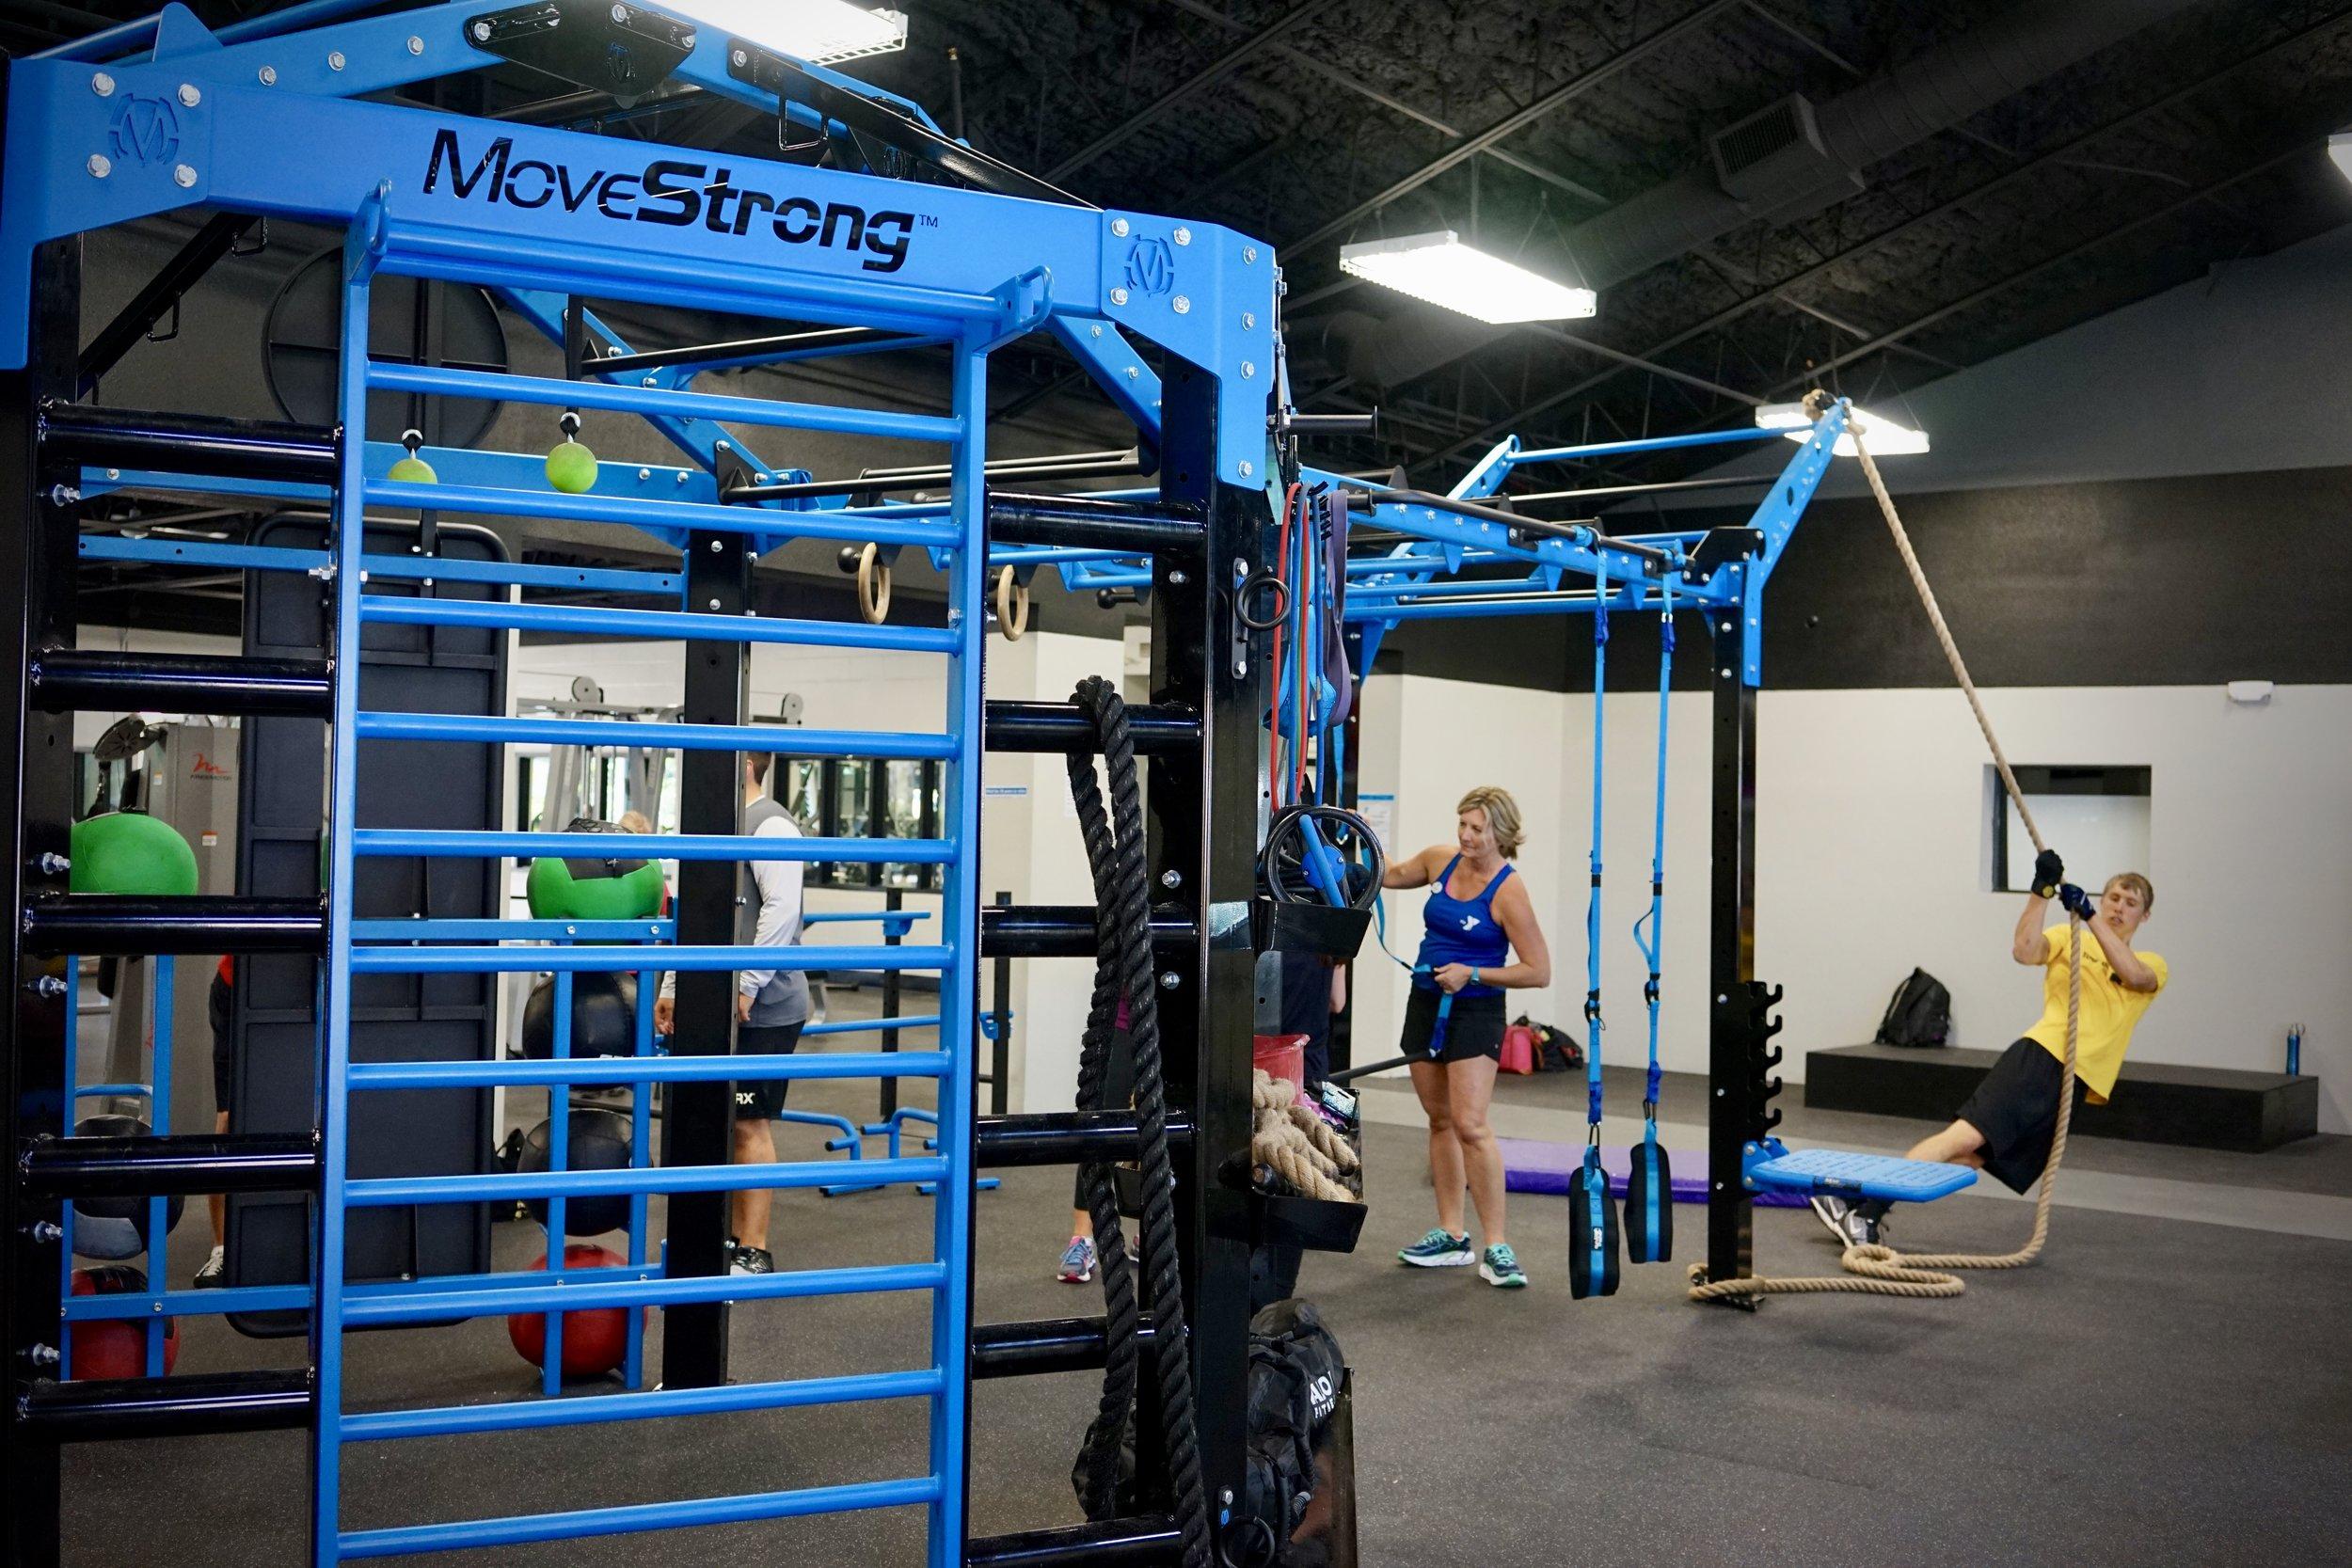 MoveStrong Nova FTS with Extended Monkey Bar Bridge